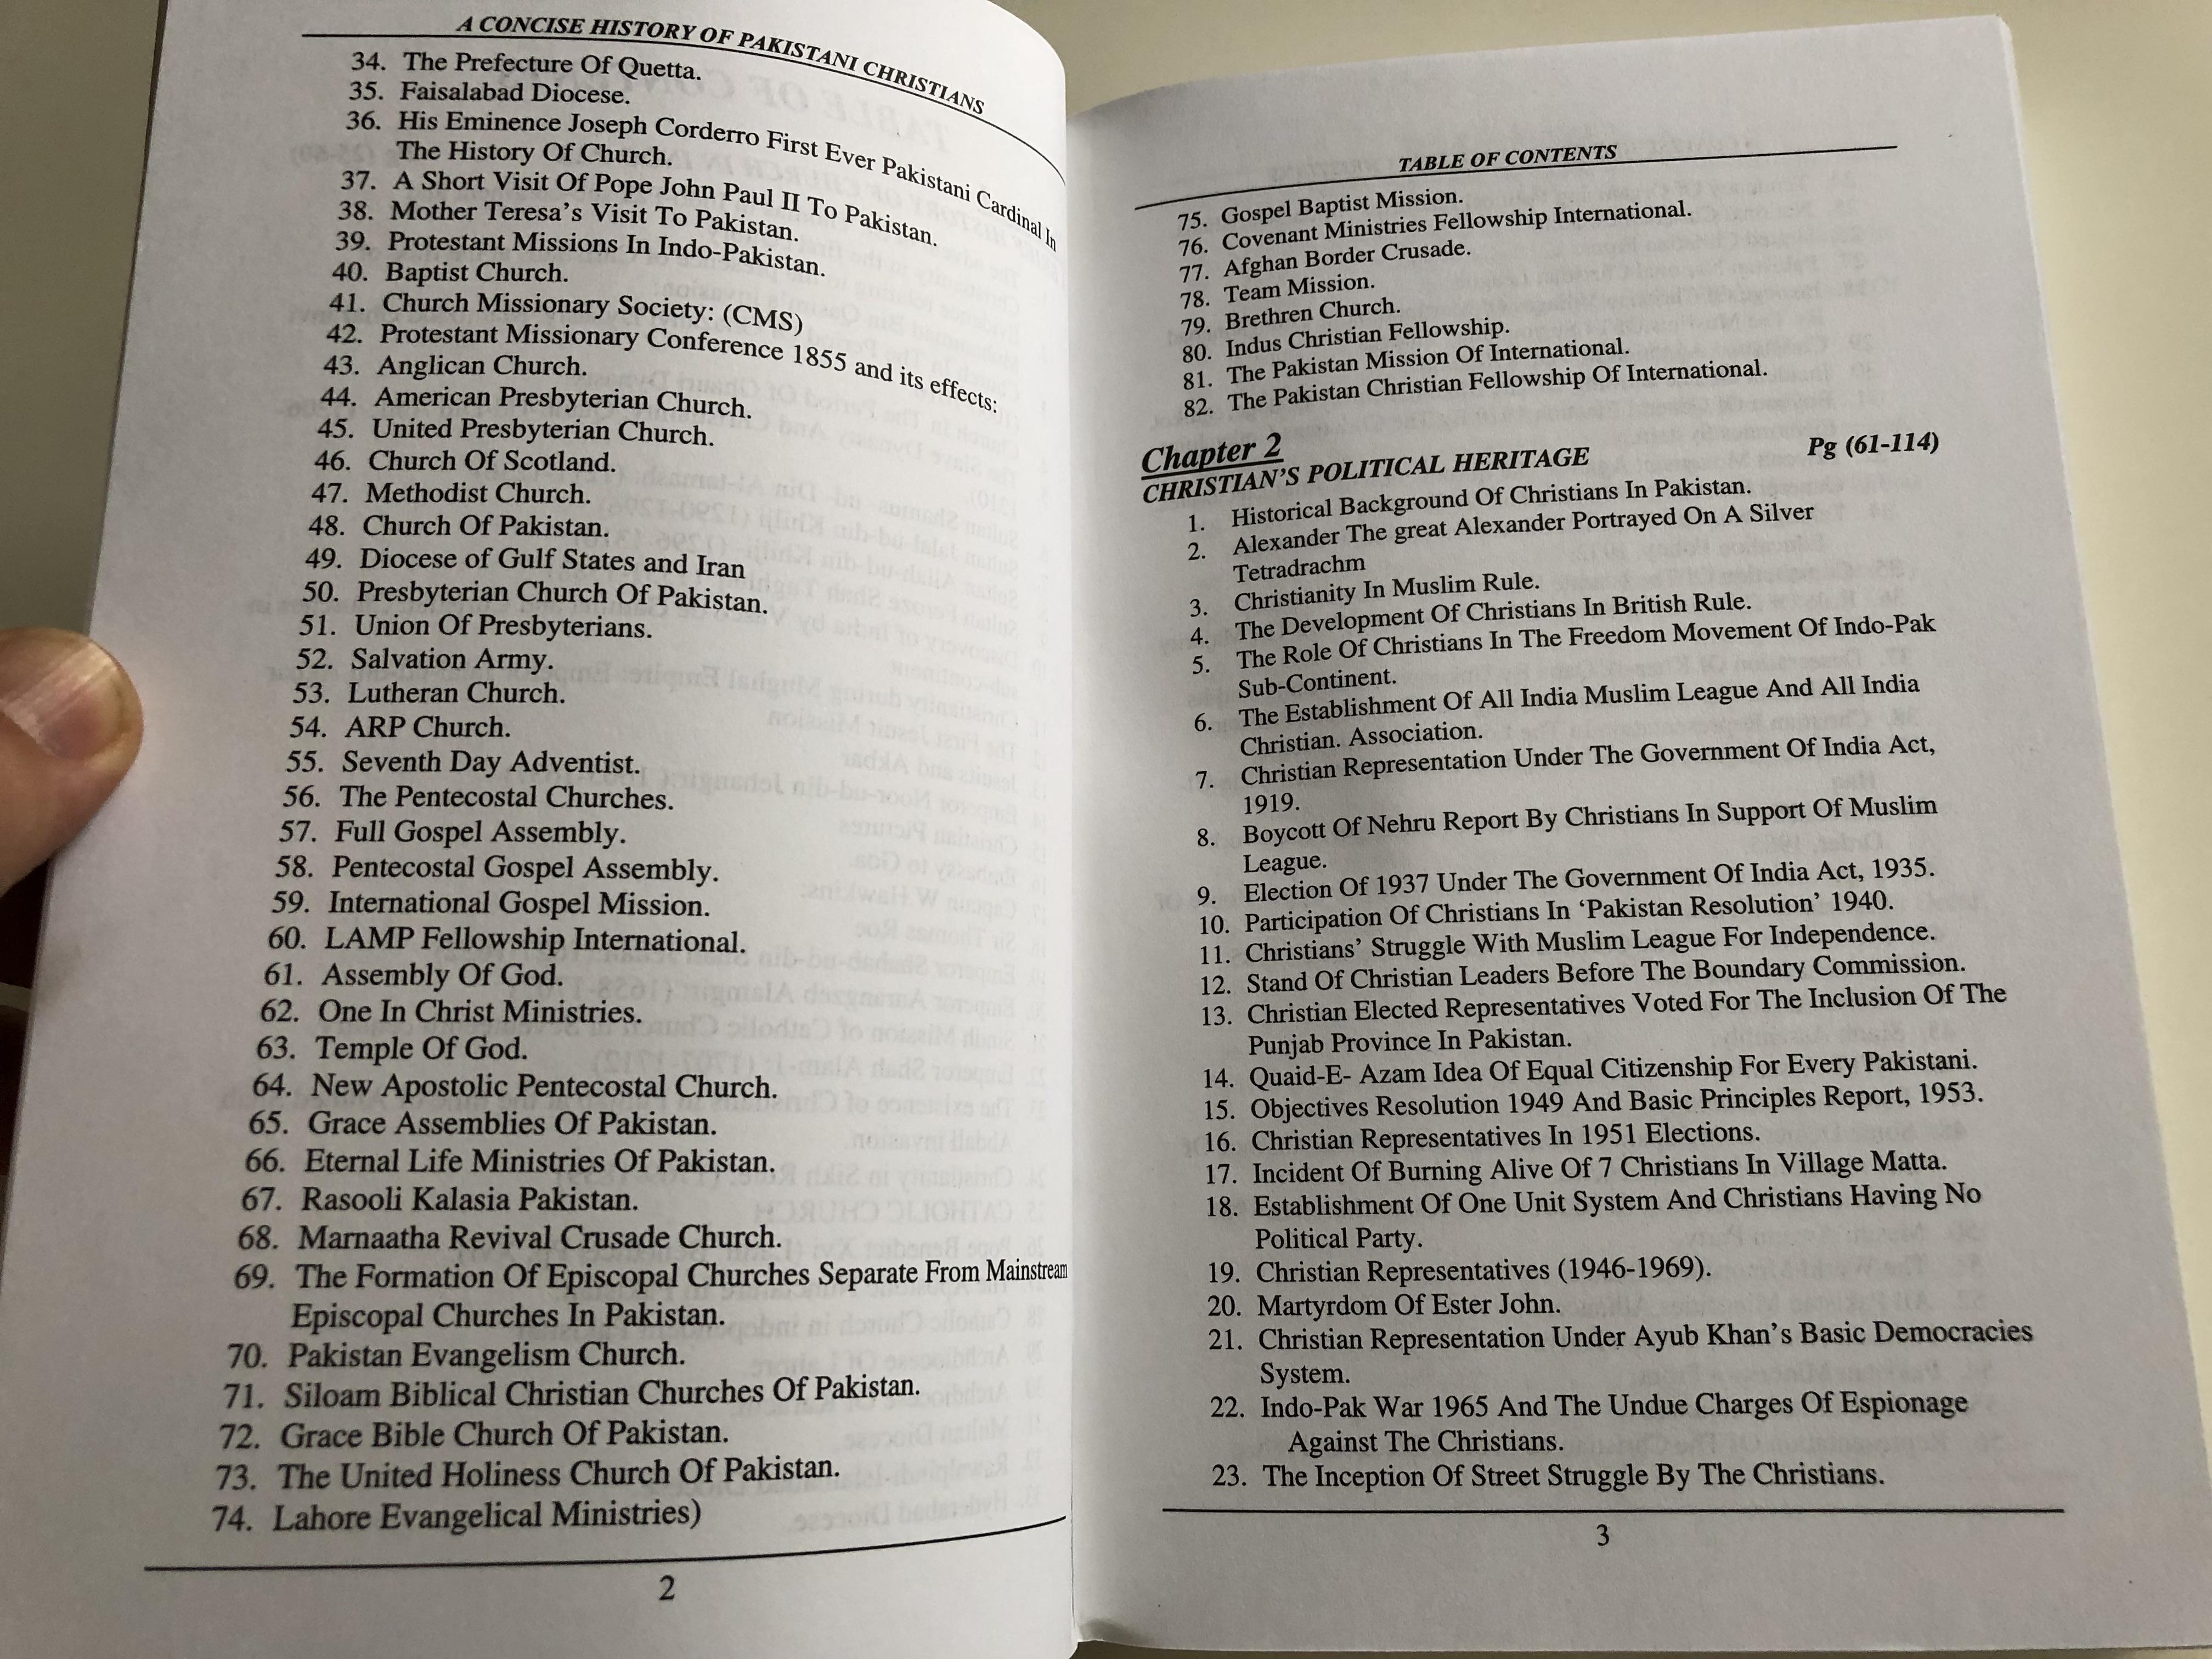 a-concise-history-of-pakistani-christians-by-emmanuel-zafar-humsookhan-publication-paperback-2007-7-.jpg